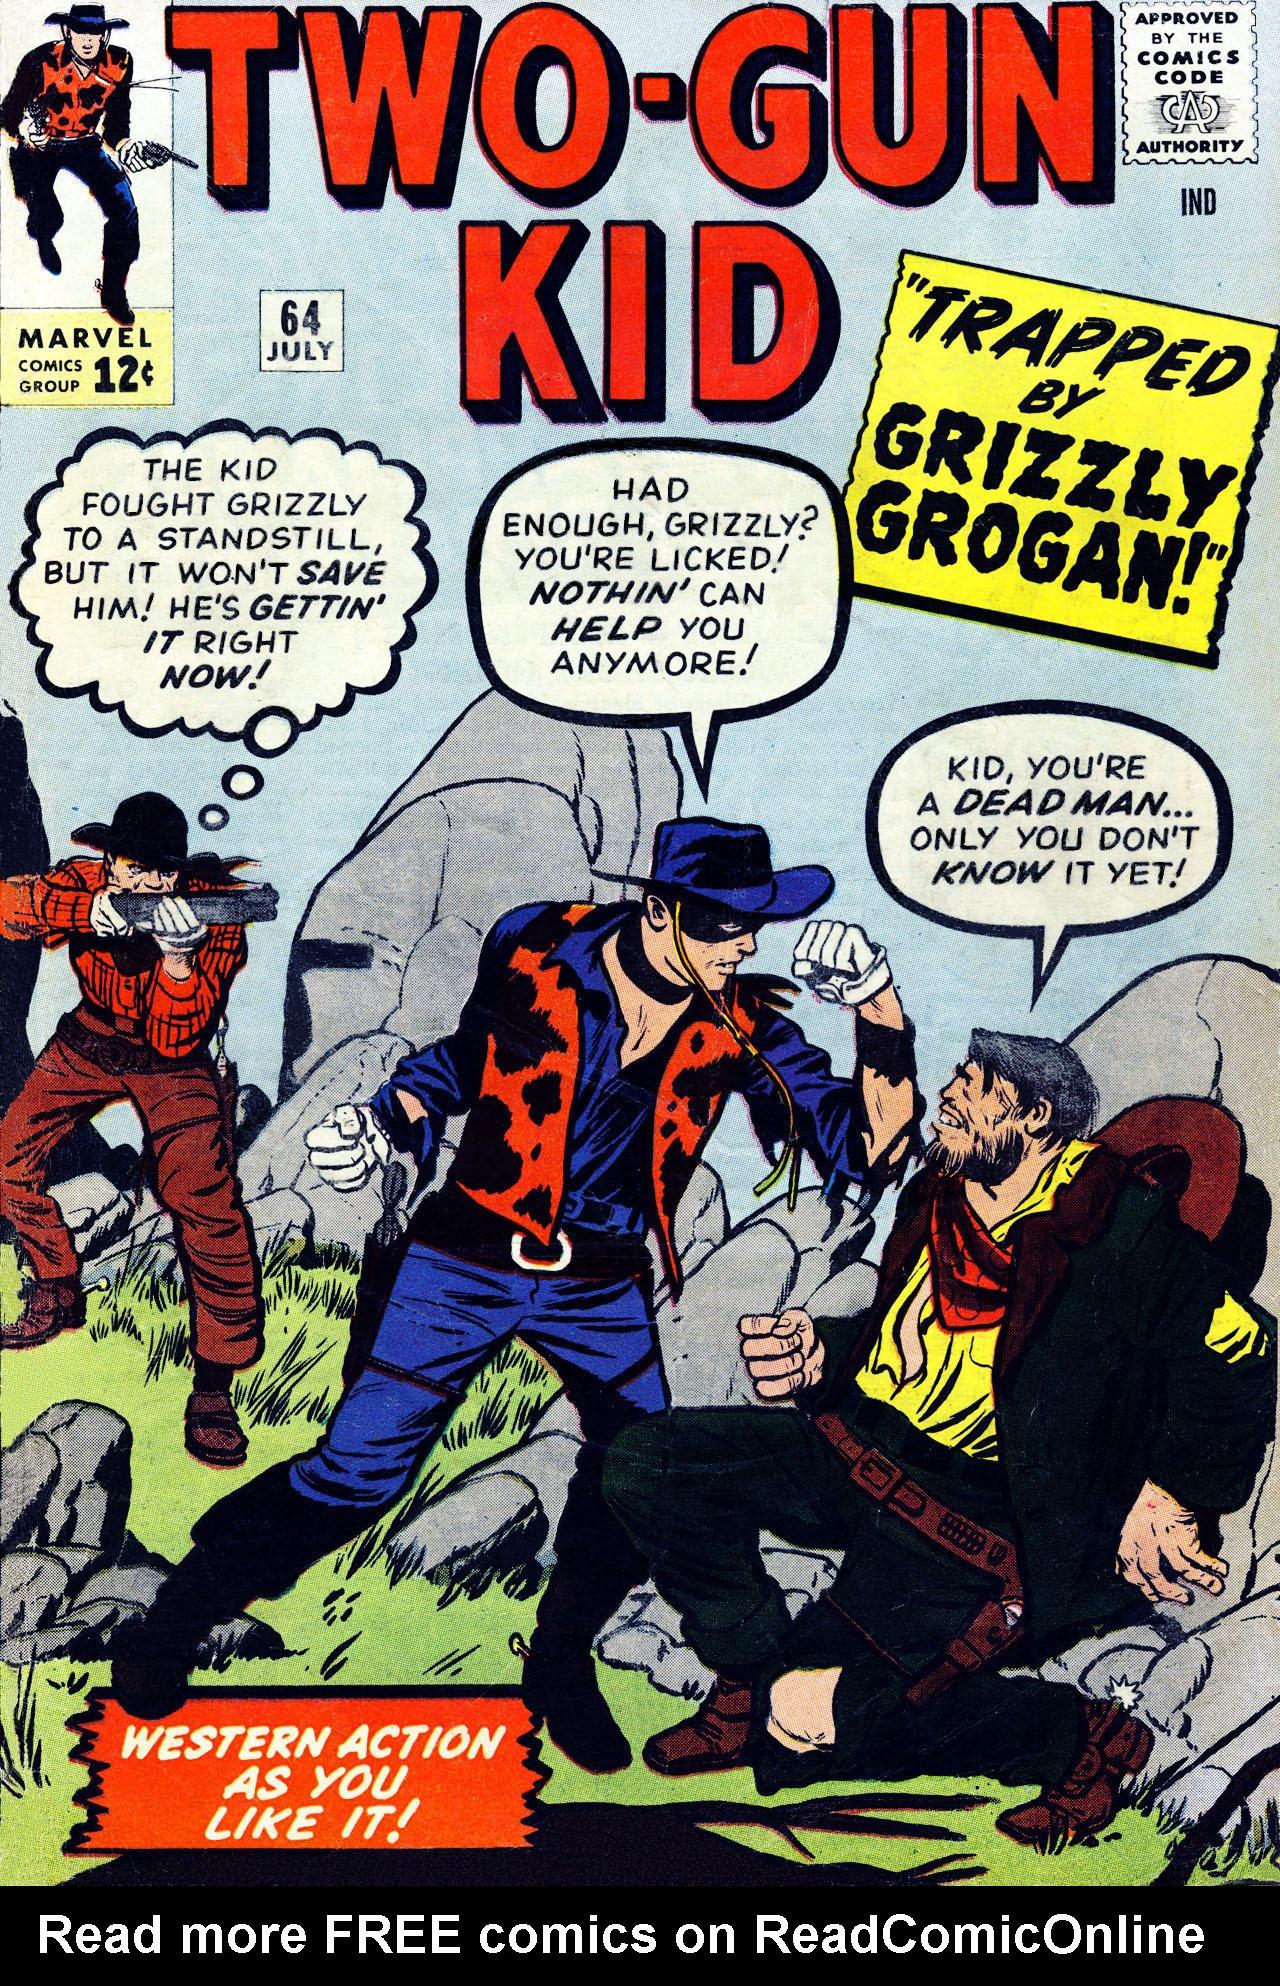 Read online Two-Gun Kid comic -  Issue #64 - 1